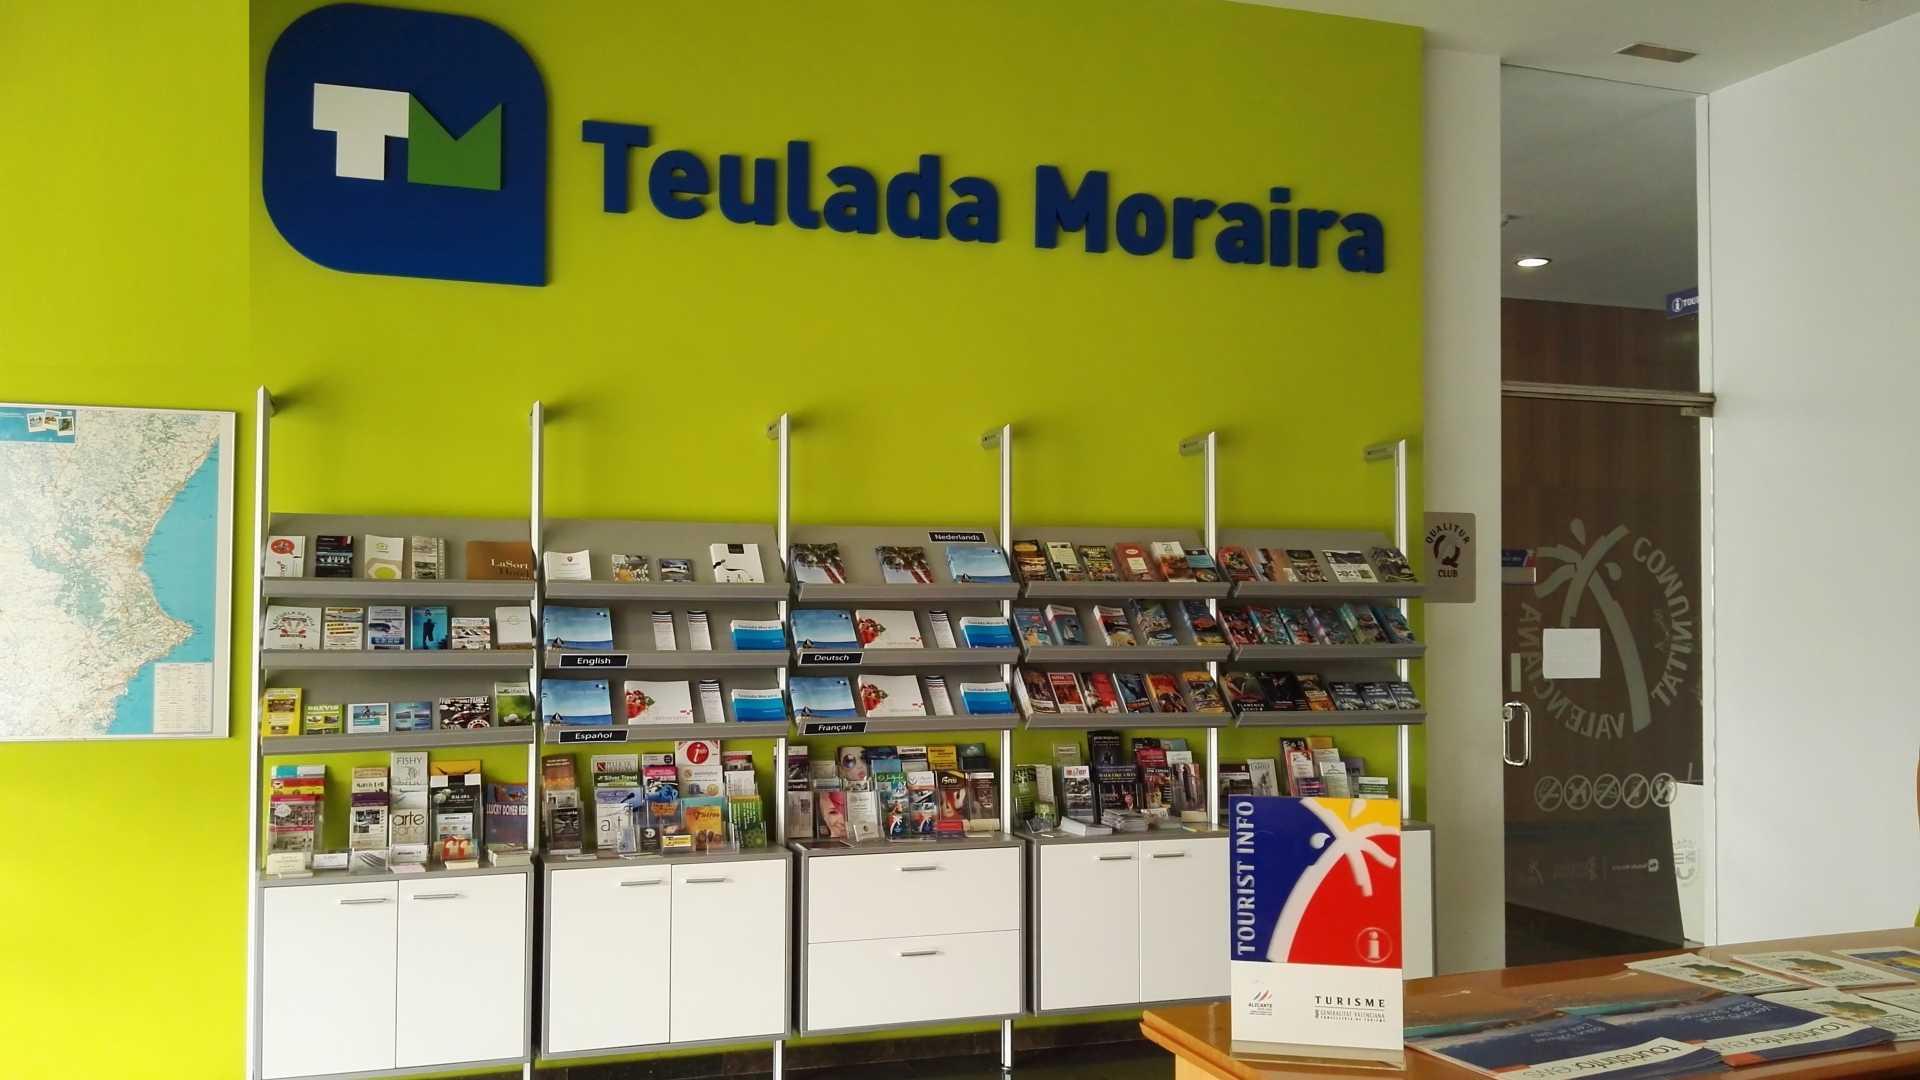 TOURIST INFO TEULADA - MORAIRA